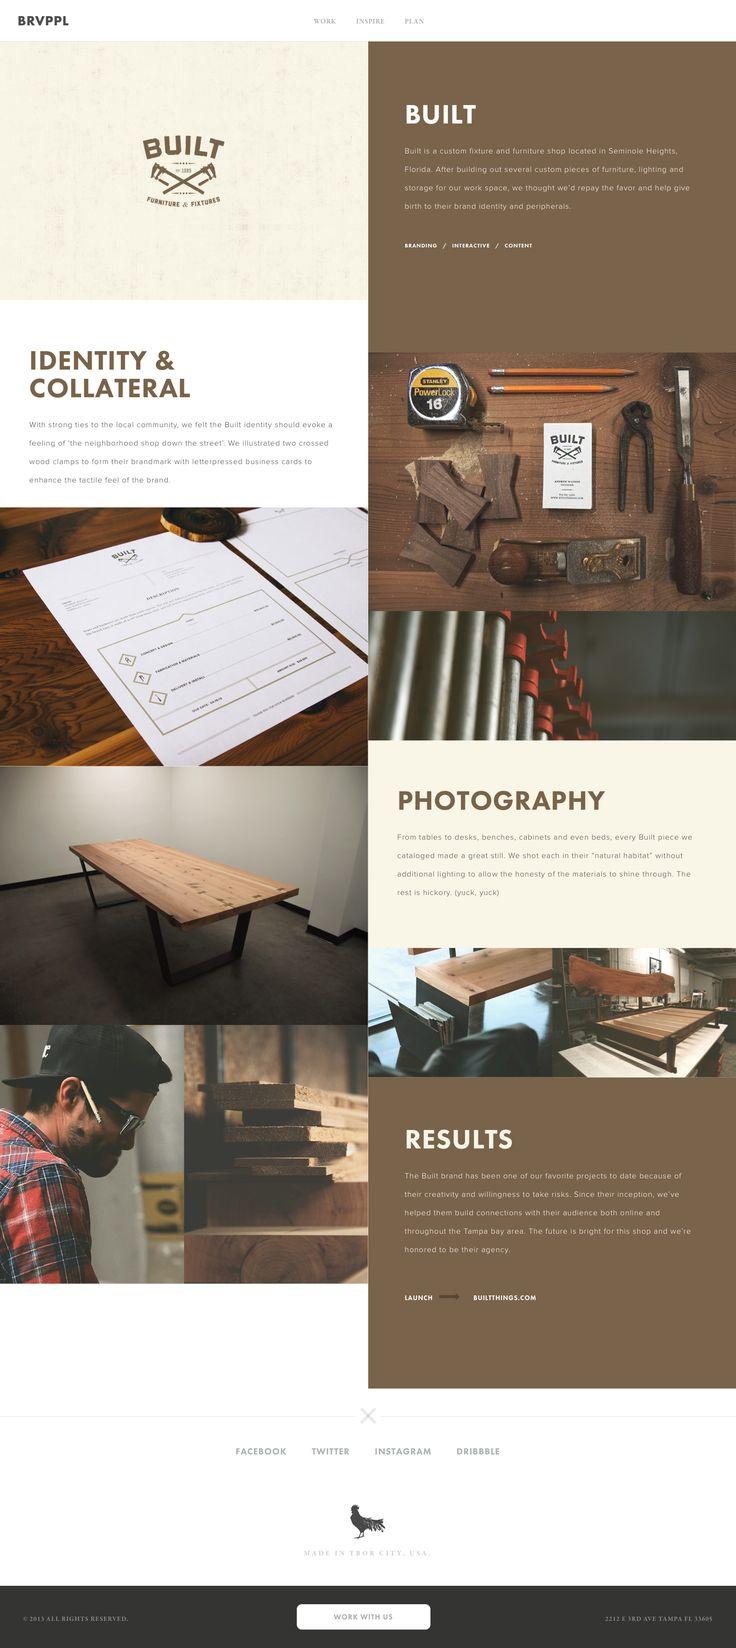 Pin By Tong Jatupong On Web Design